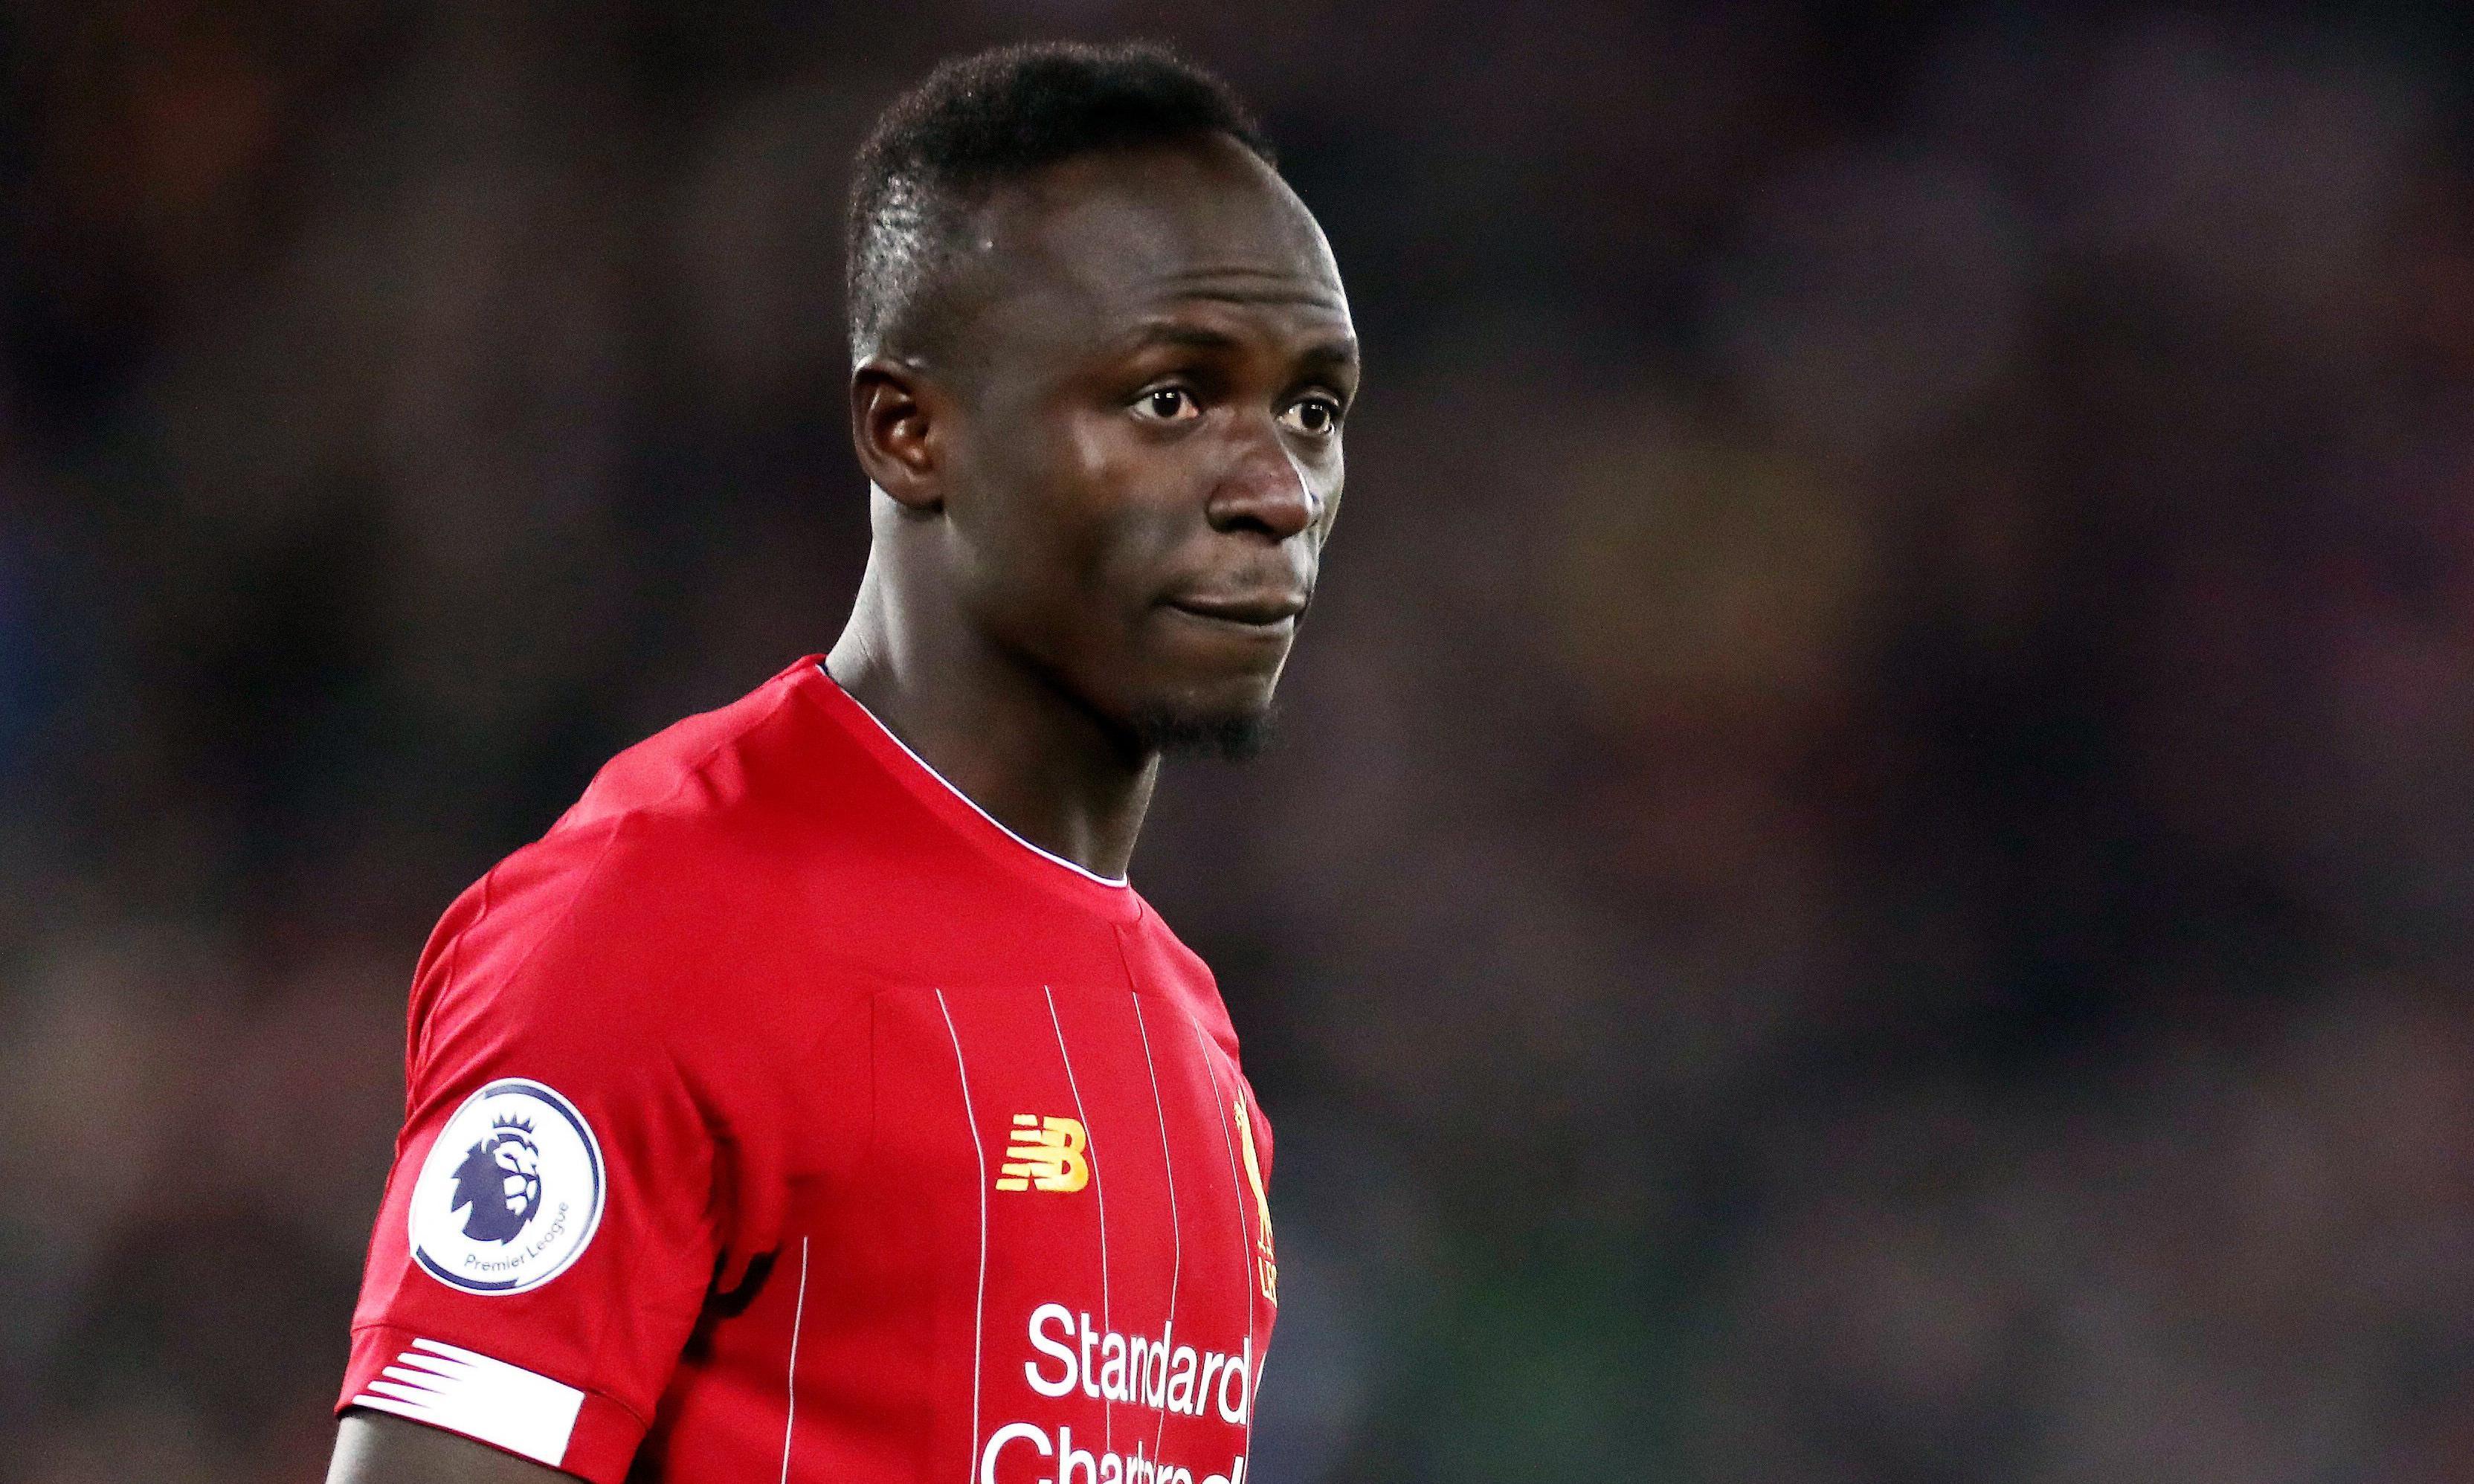 Football transfer rumours: PSG to move for Liverpool's Sadio Mané?